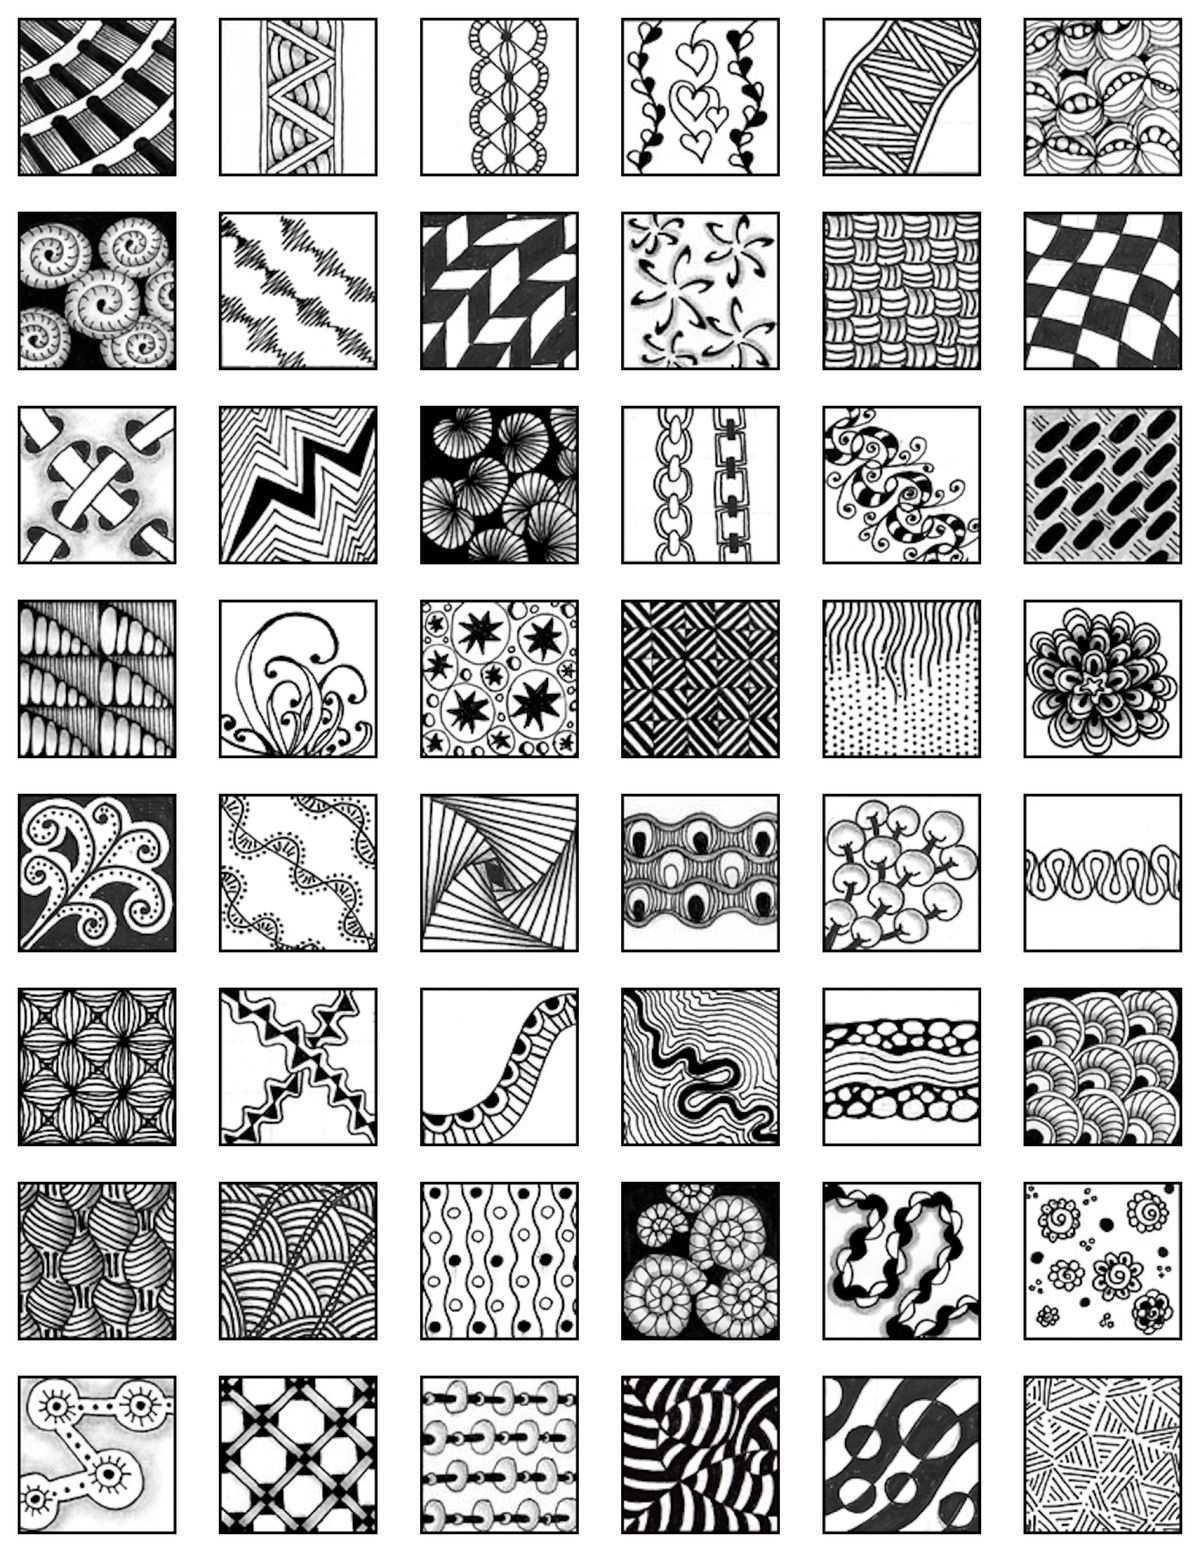 Fa50d000f802080fcd6ad2e638cecb40 Jpg 1 200 1 552 Pixeles Zentangle Kunst Muster Malen Zentangle Designs